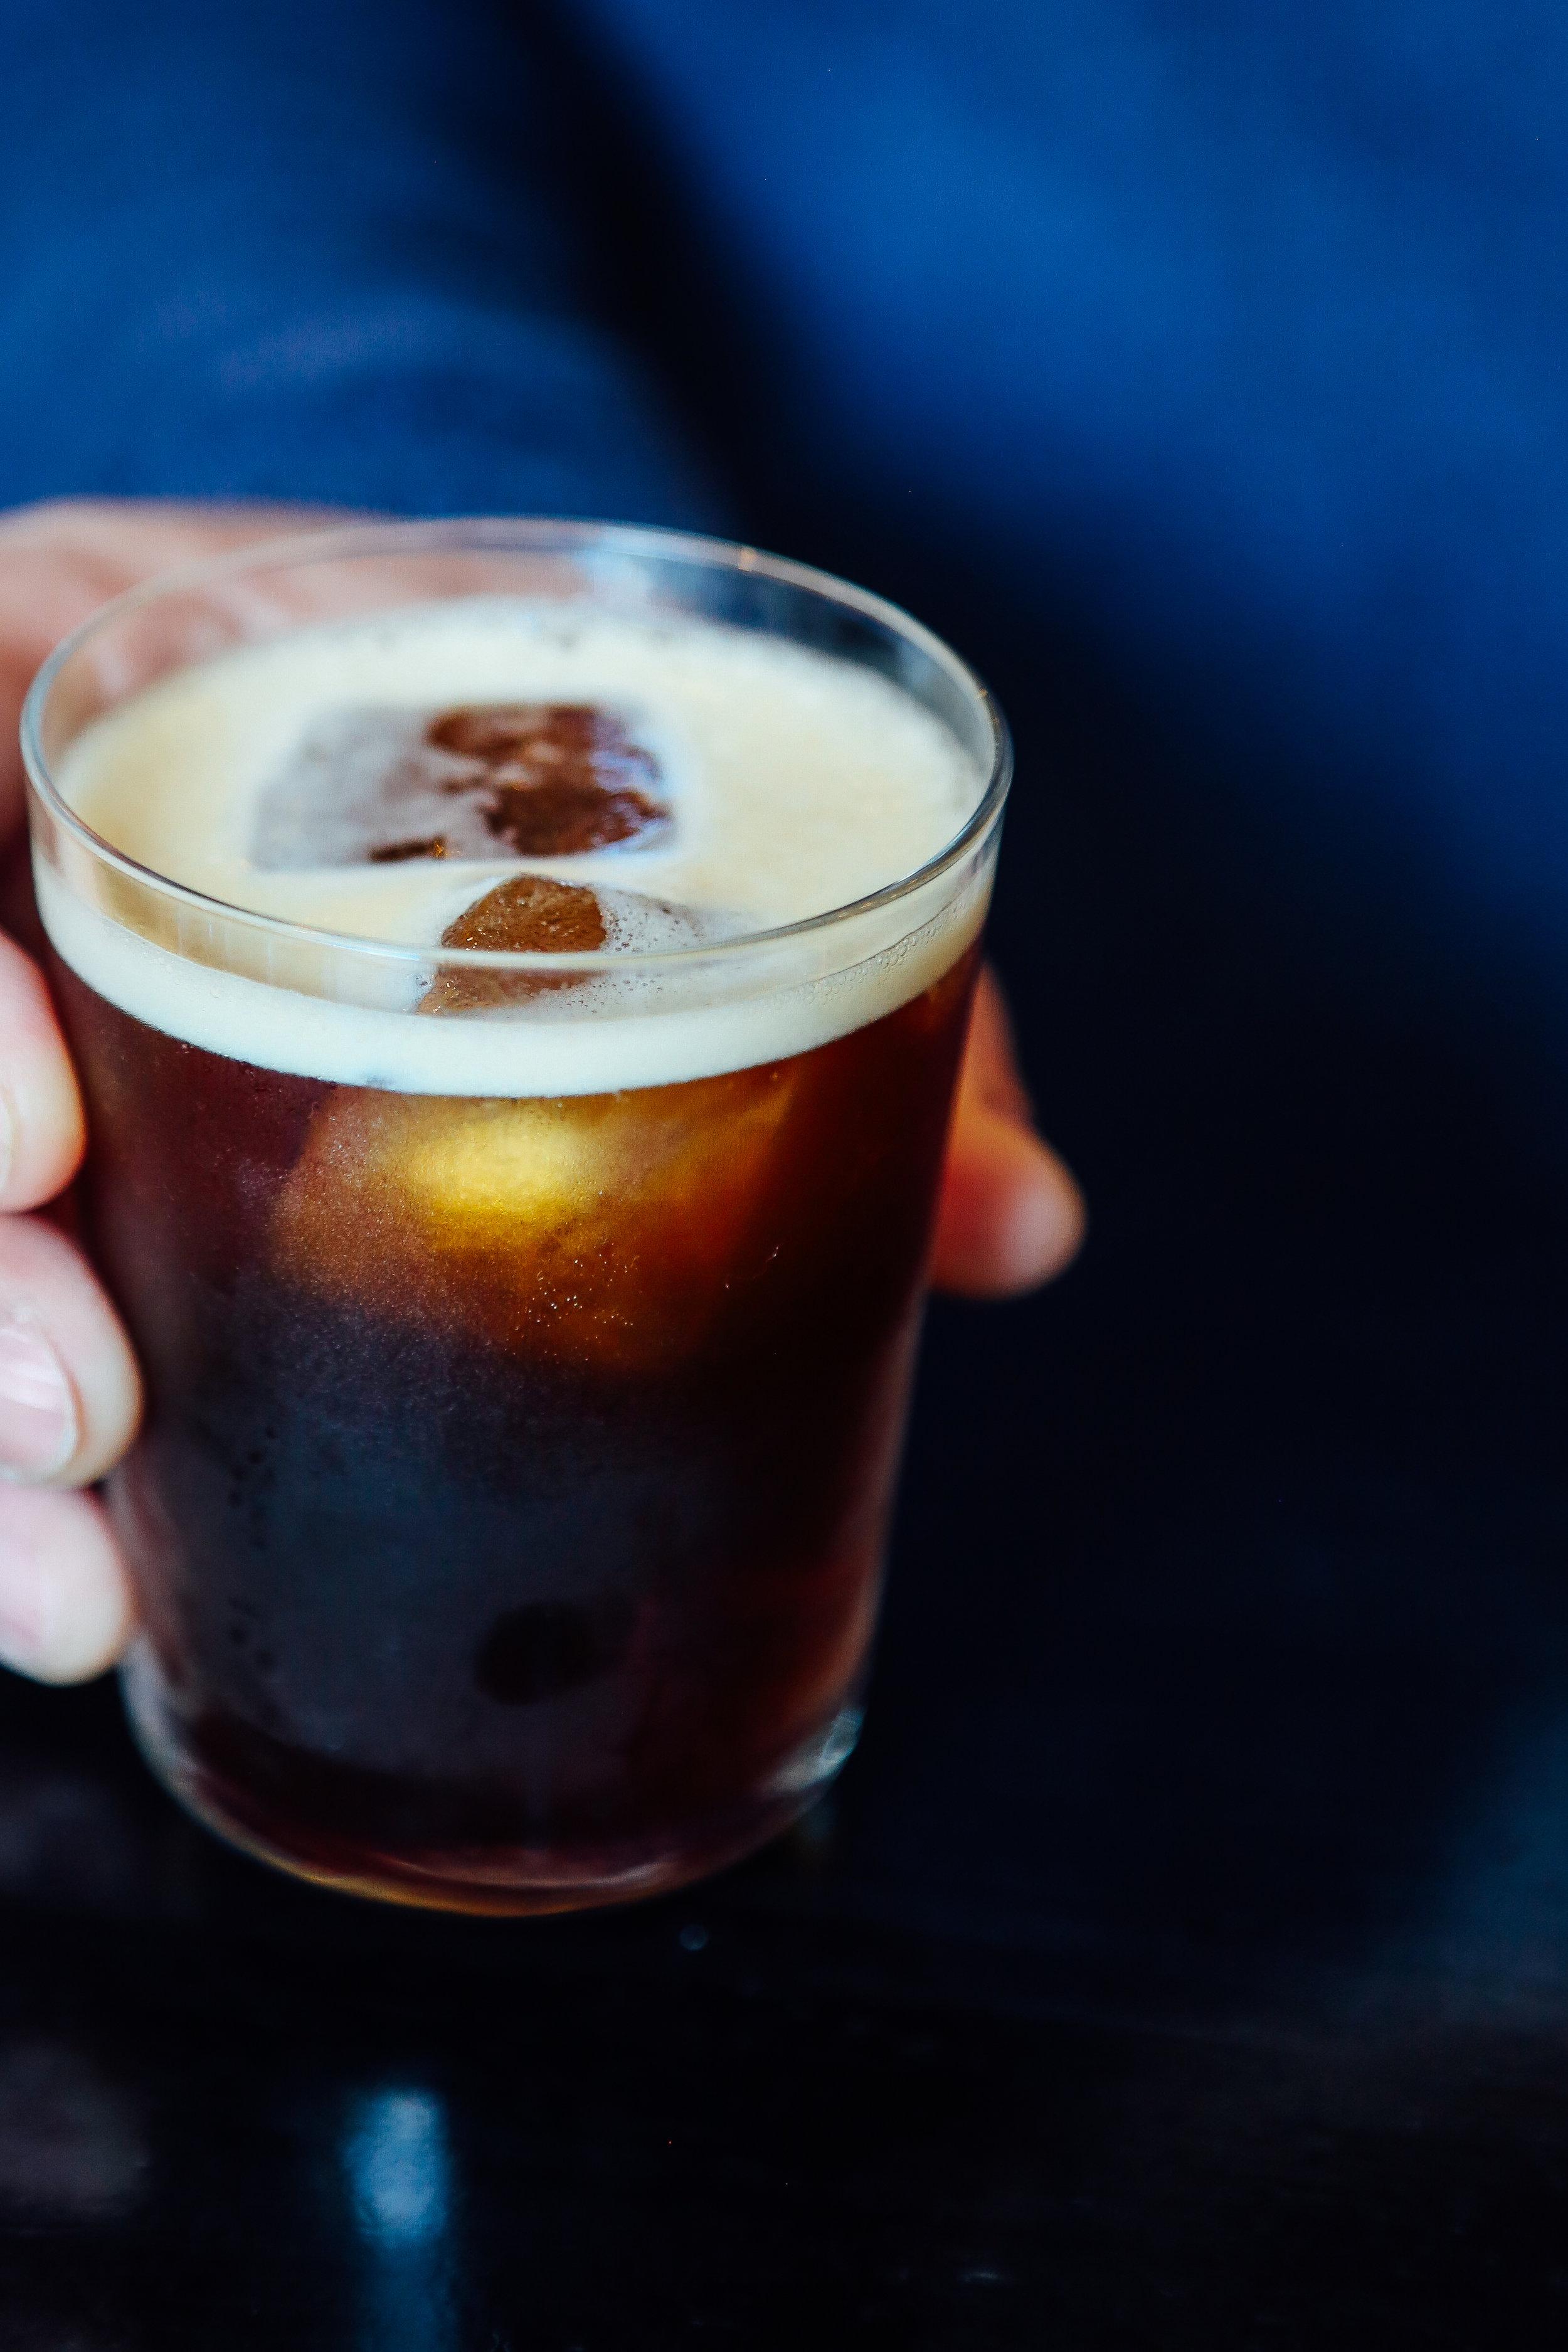 icy hot - Cold brew, bourbon, cynar, montenegro